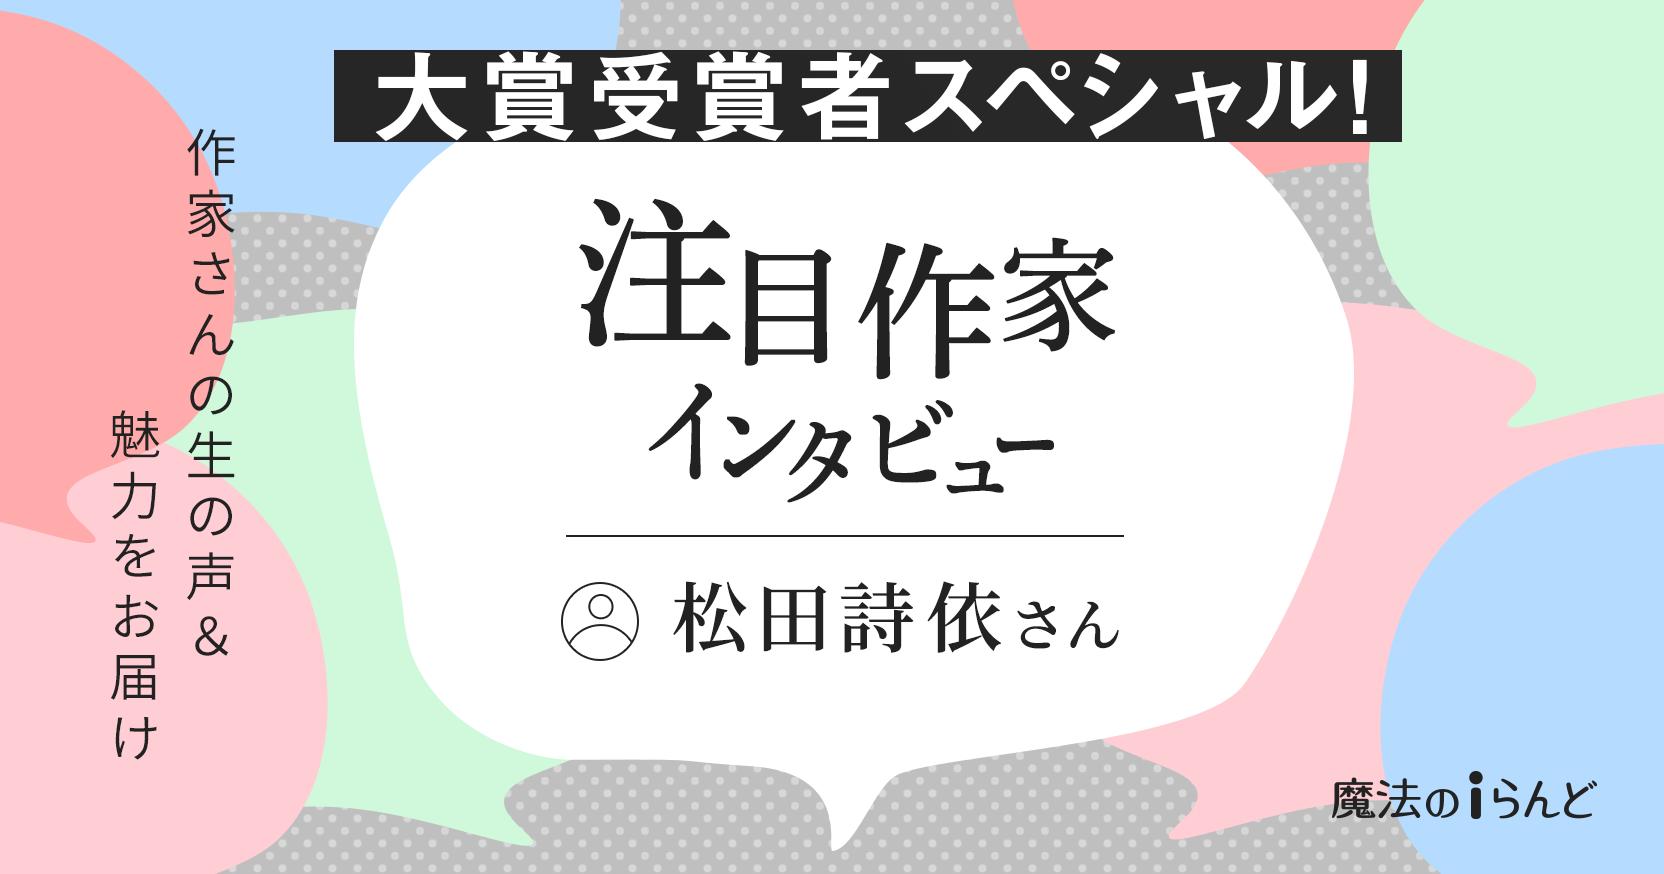 https://storage.googleapis.com/blog-info/entry/2021/04/interview_ogp_shiyori.png